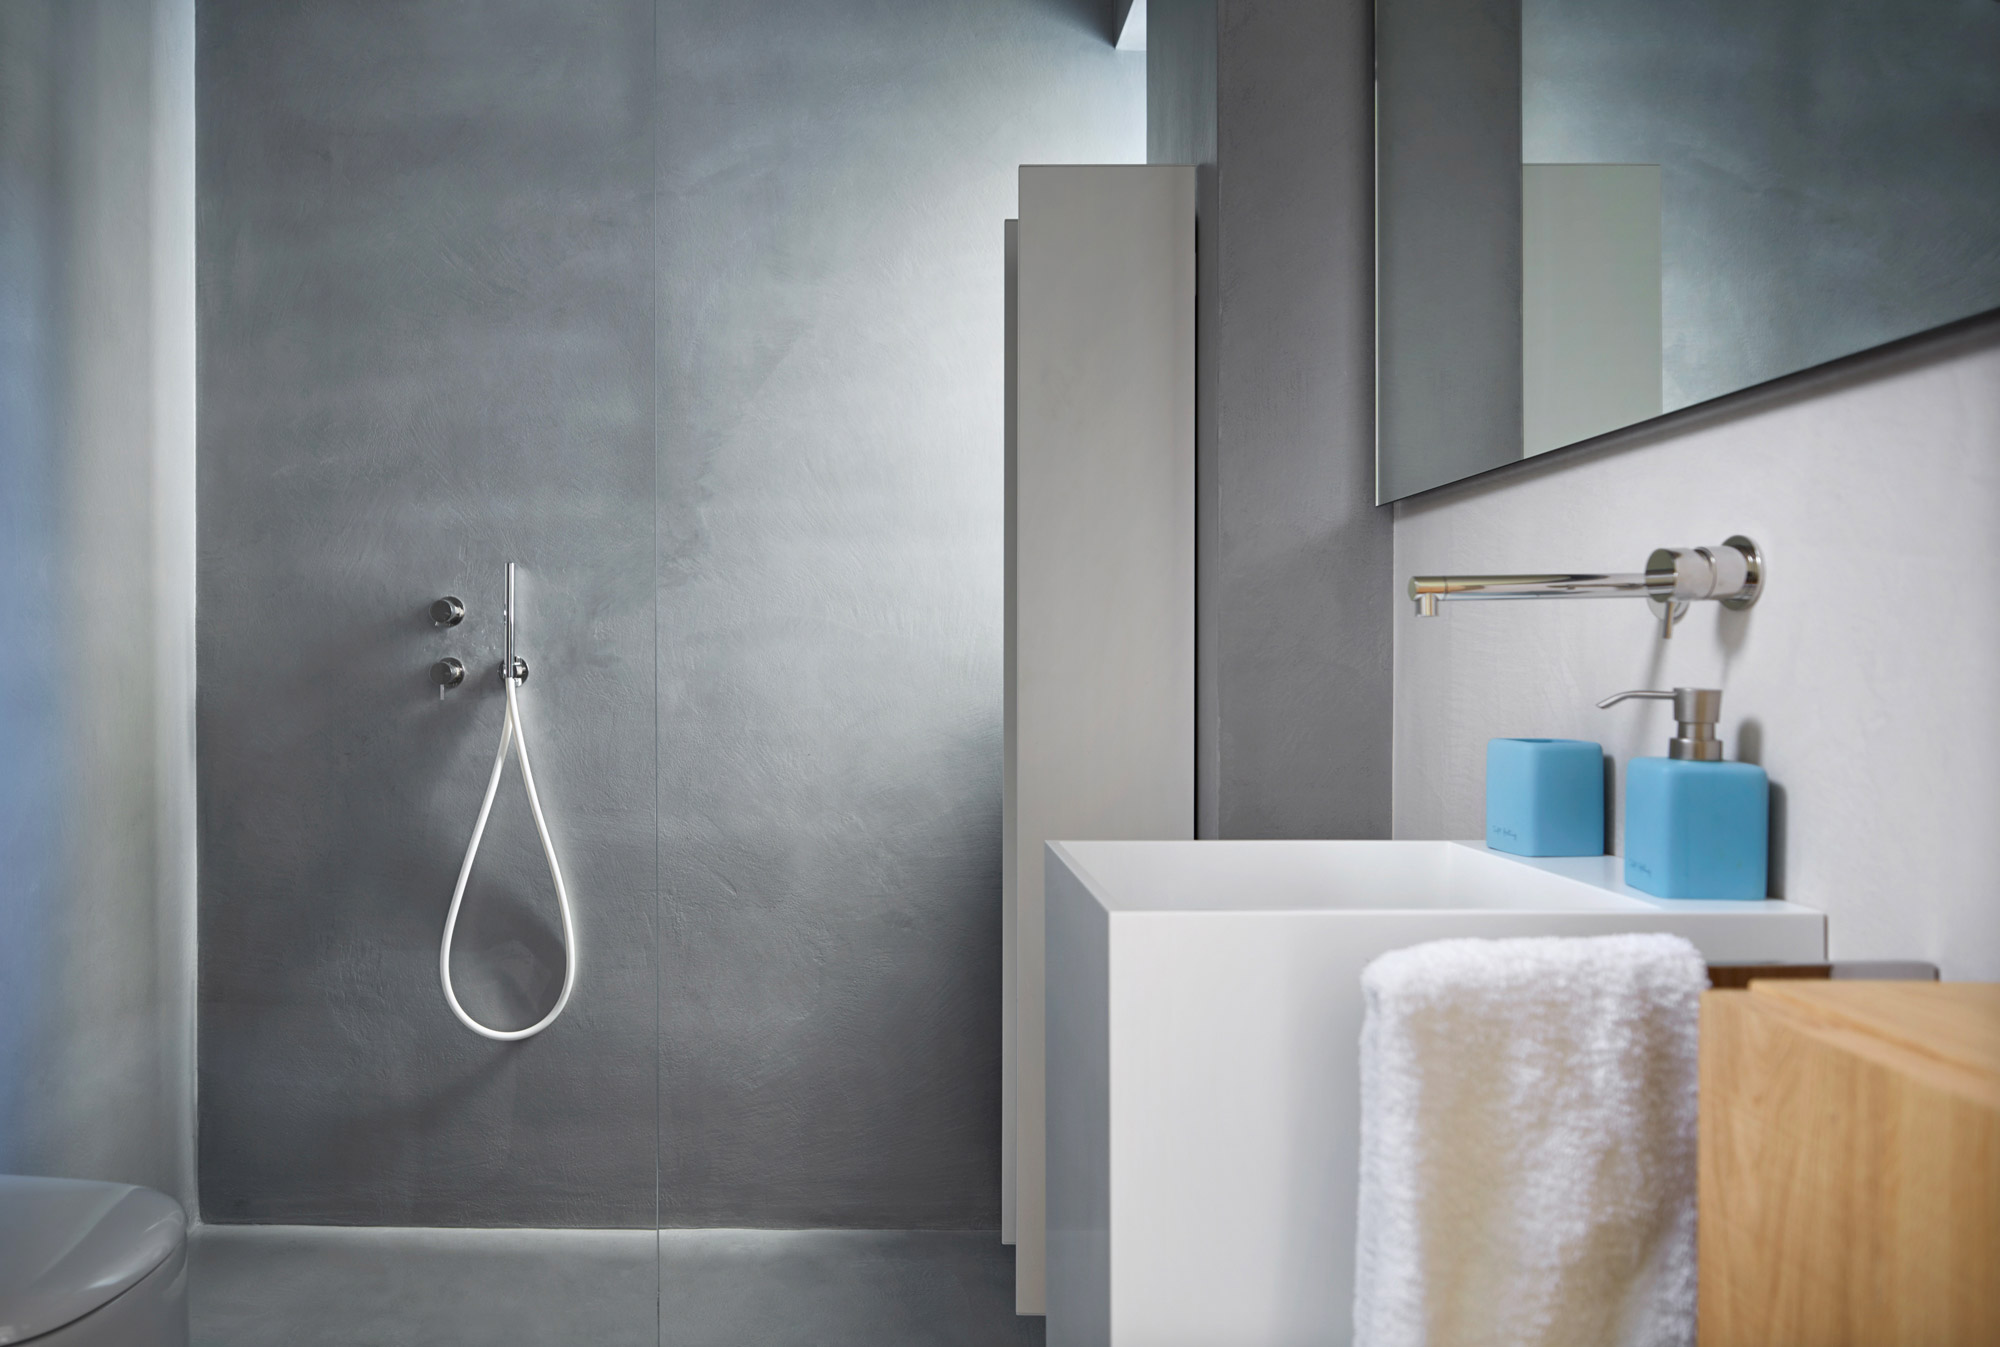 comment cr er une salle de bain sans carrelage ideal work. Black Bedroom Furniture Sets. Home Design Ideas